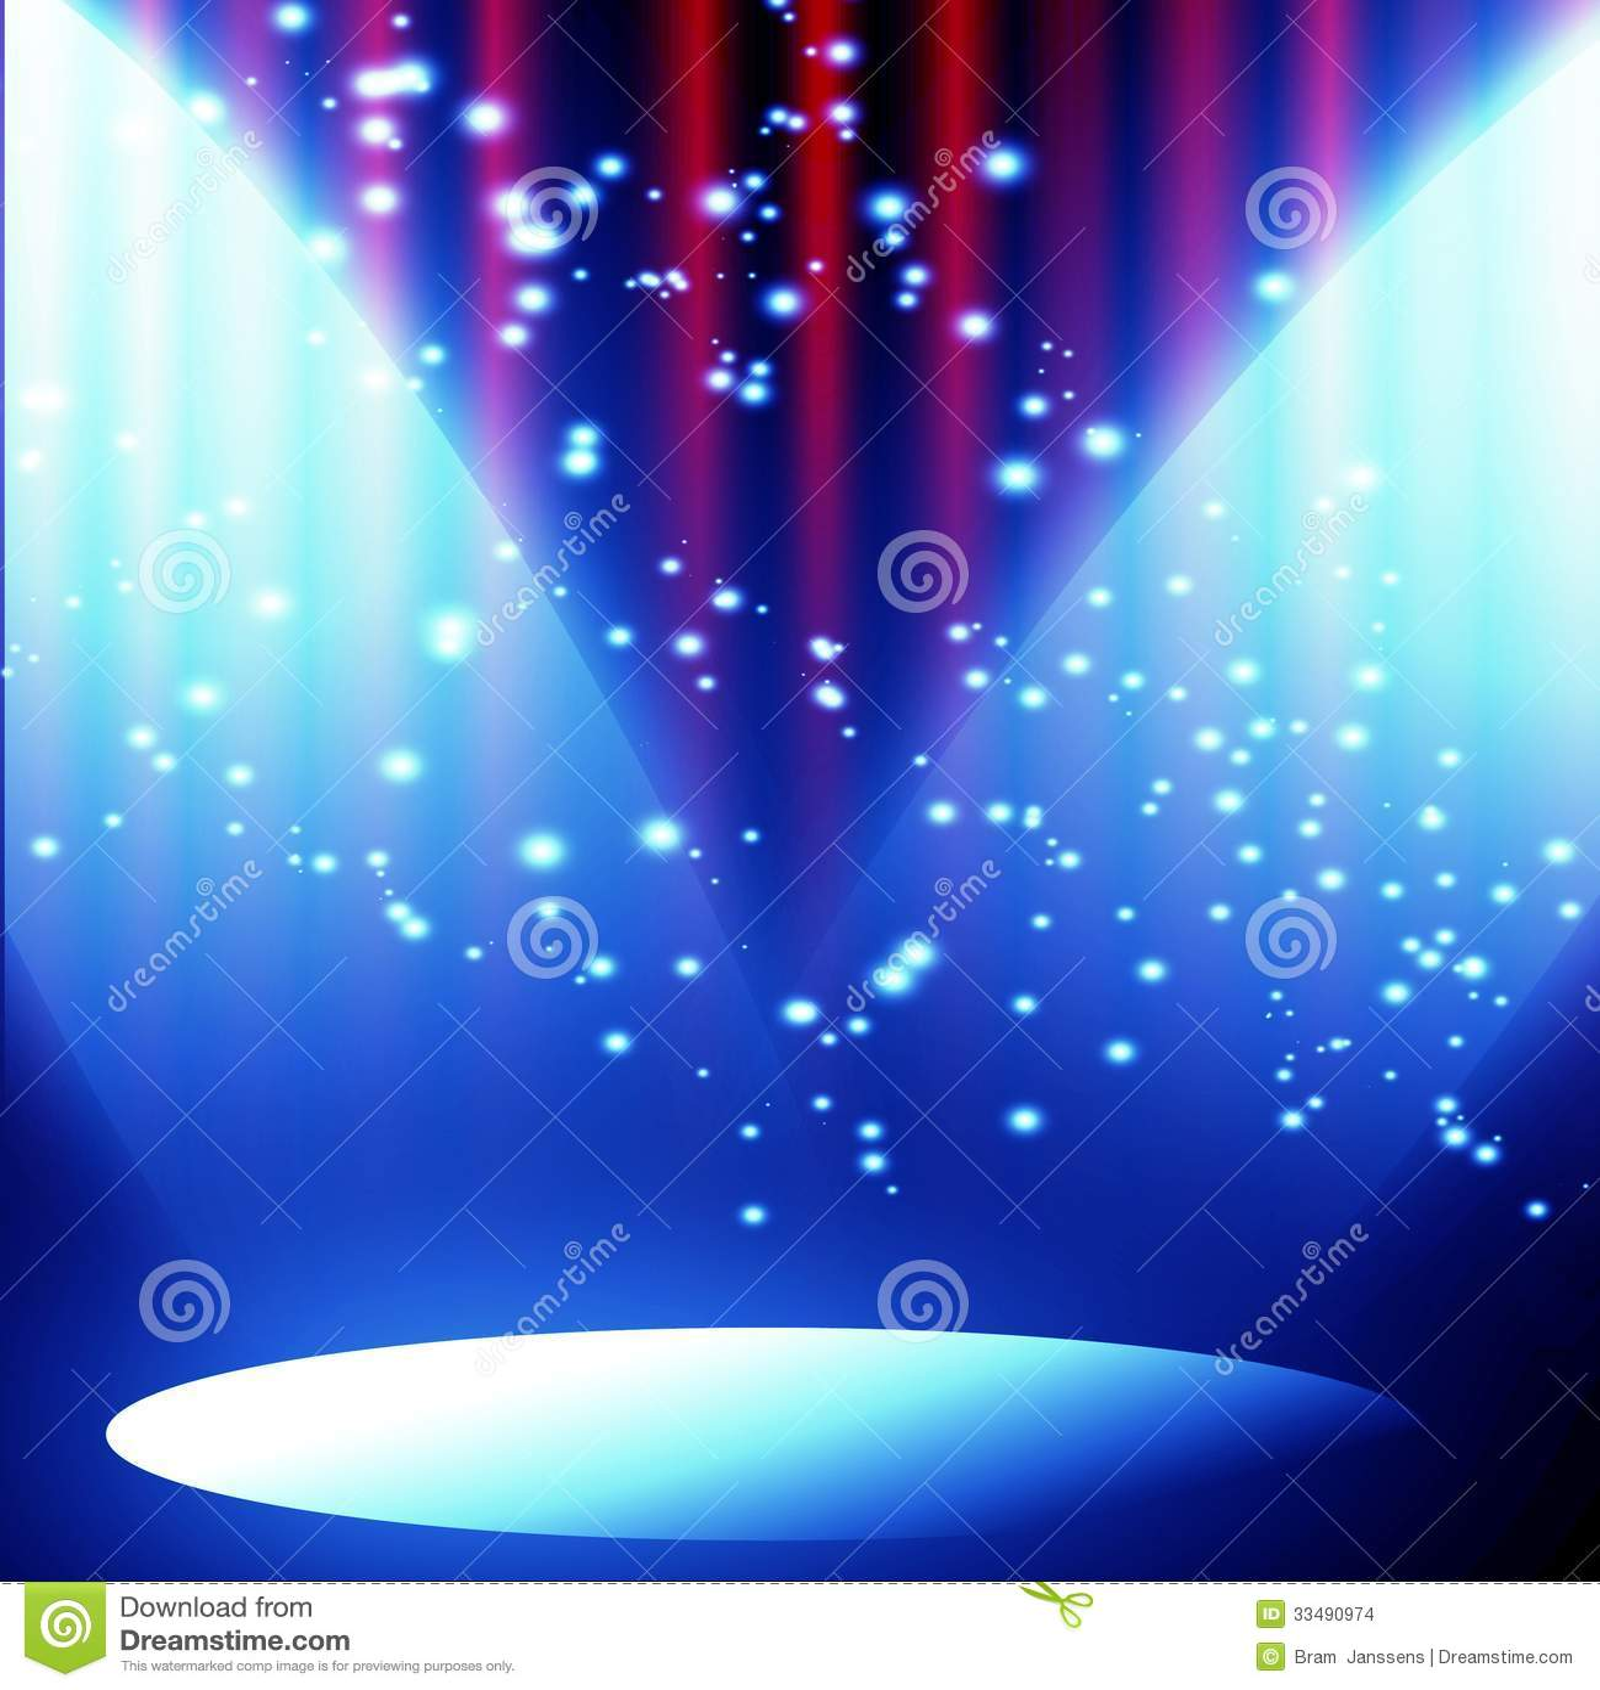 Red curtains with spotlight - Curtain Movie Red Spotlight